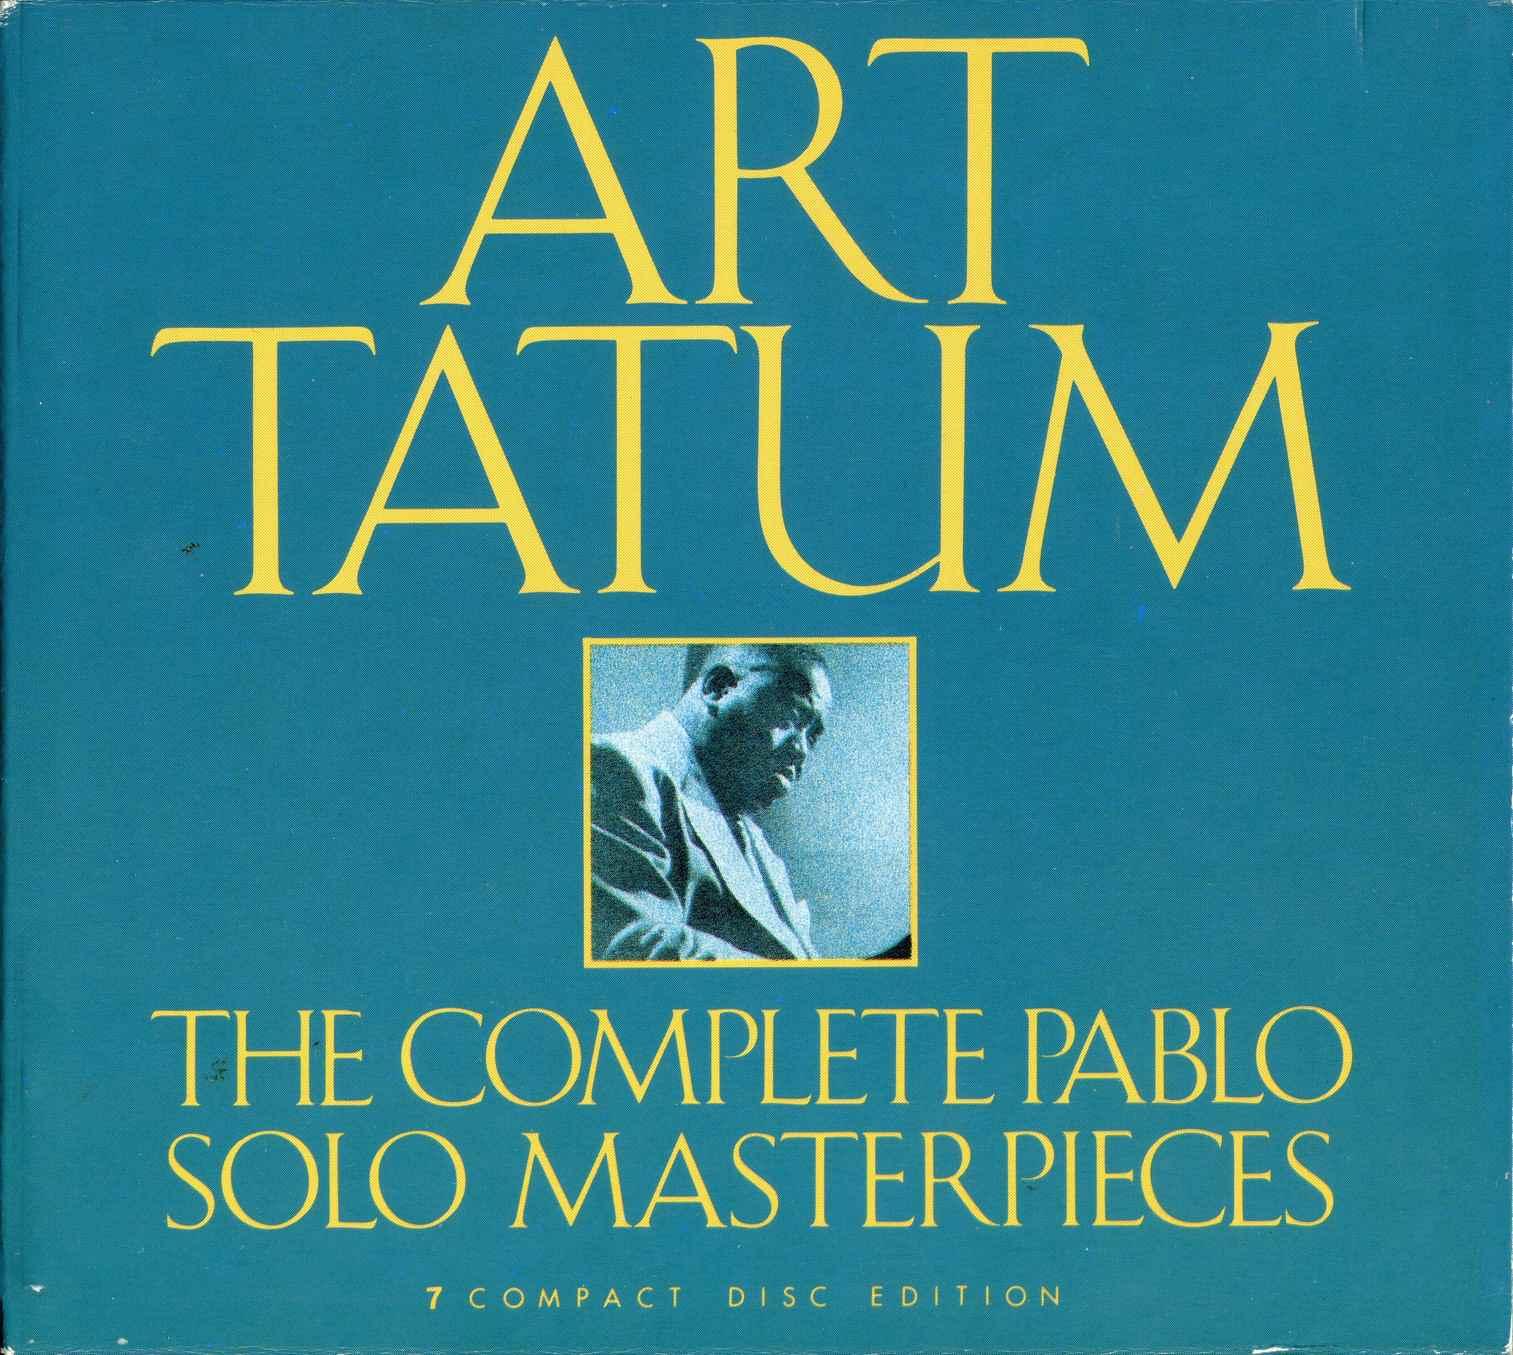 Art Tatum: The Best Of Complete Pablo Solo Masterpieces